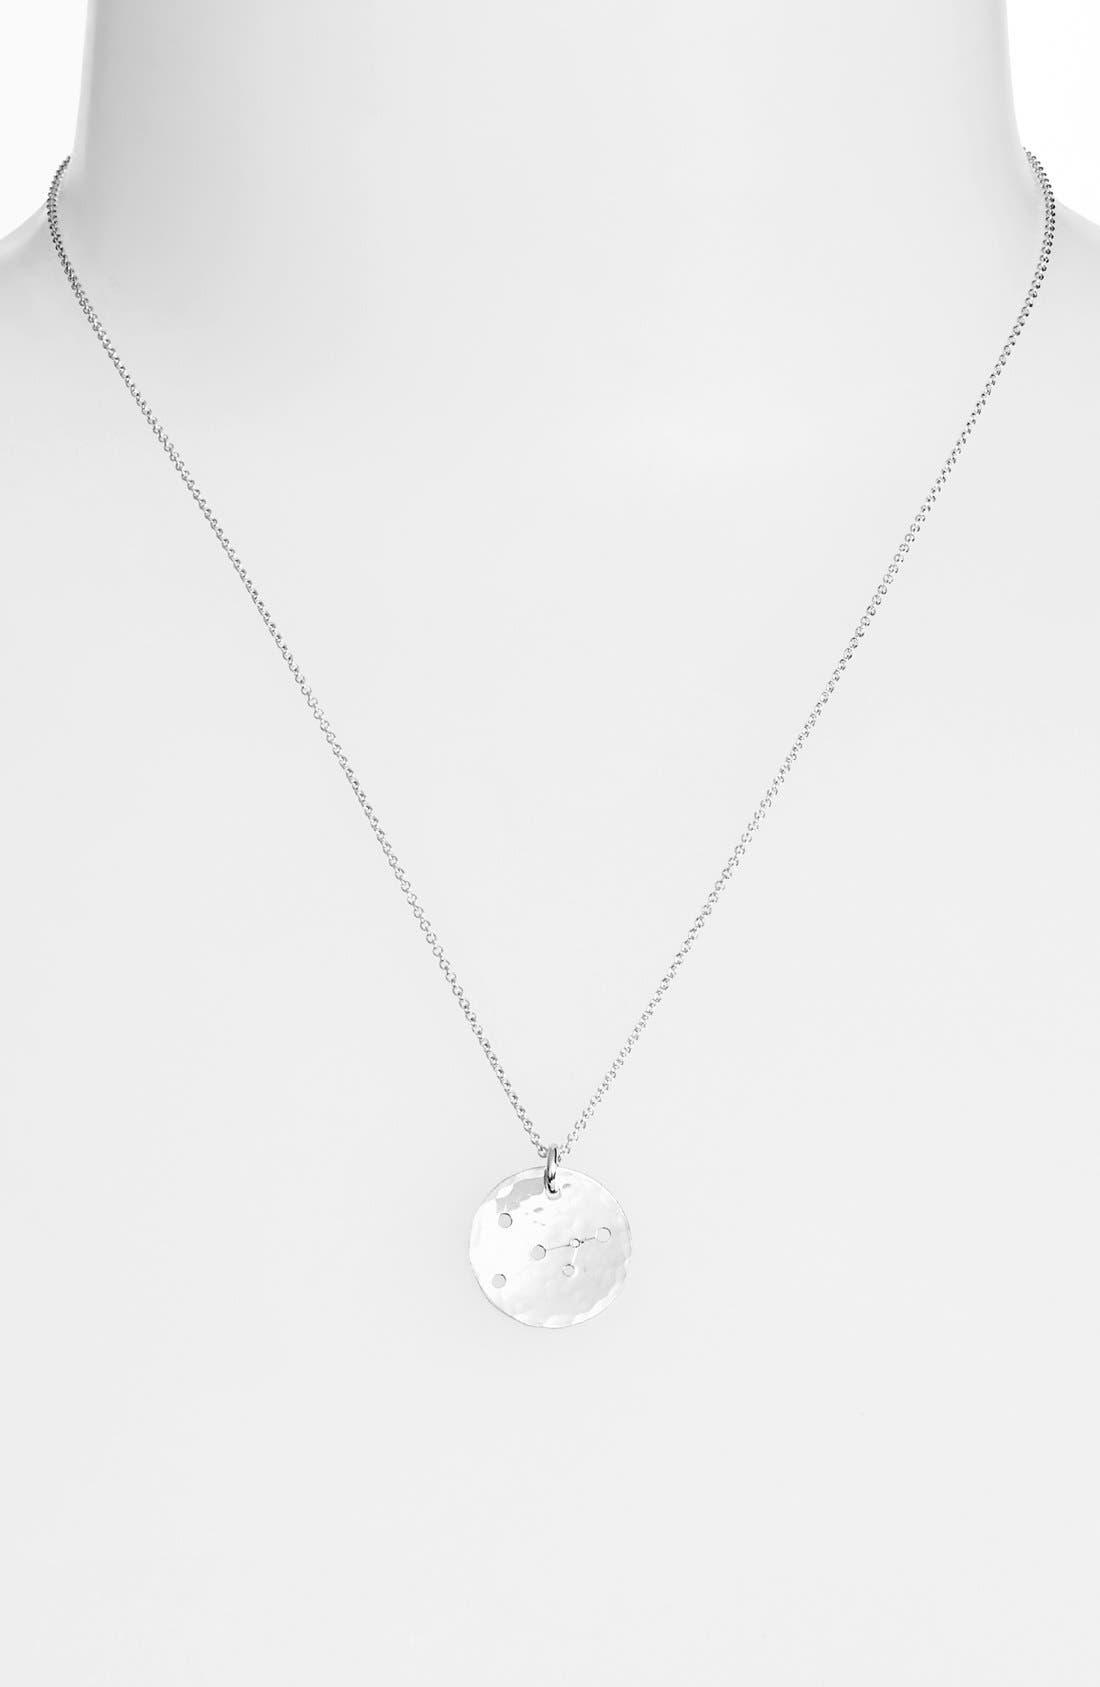 Main Image - Ija 'Small Zodiac' Sterling Silver Necklace